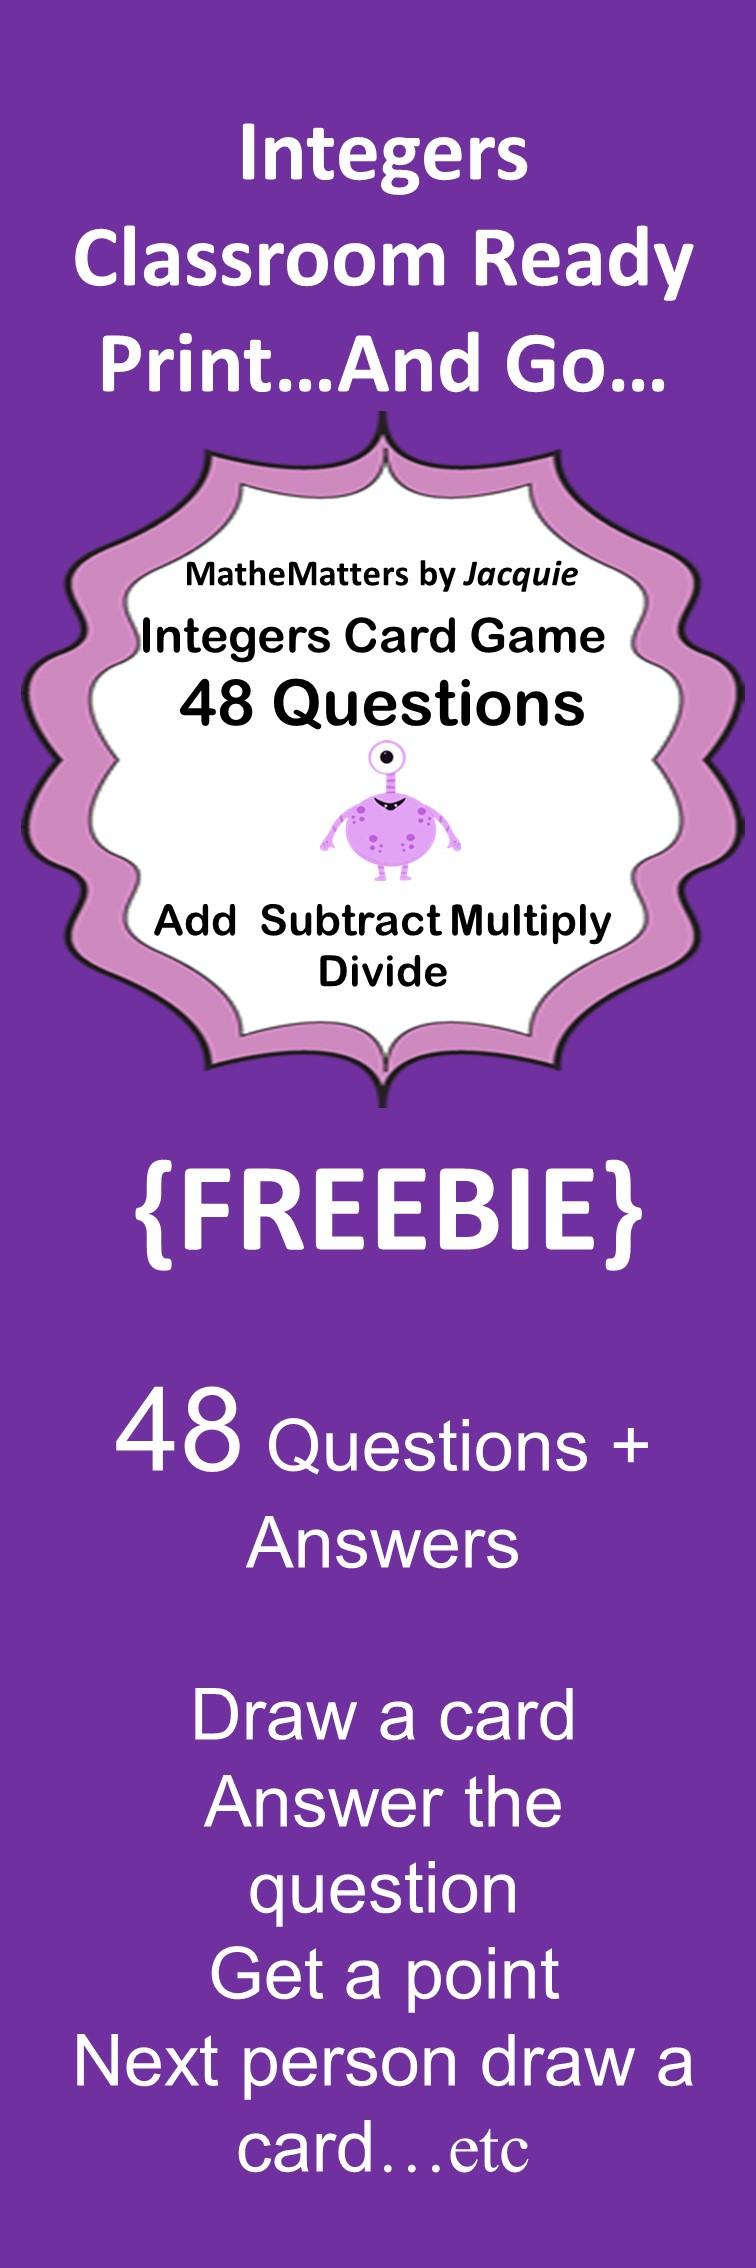 worksheet Add Subtract Multiply Divide freebie integers add subtract multiply divide 48 awesome multiply